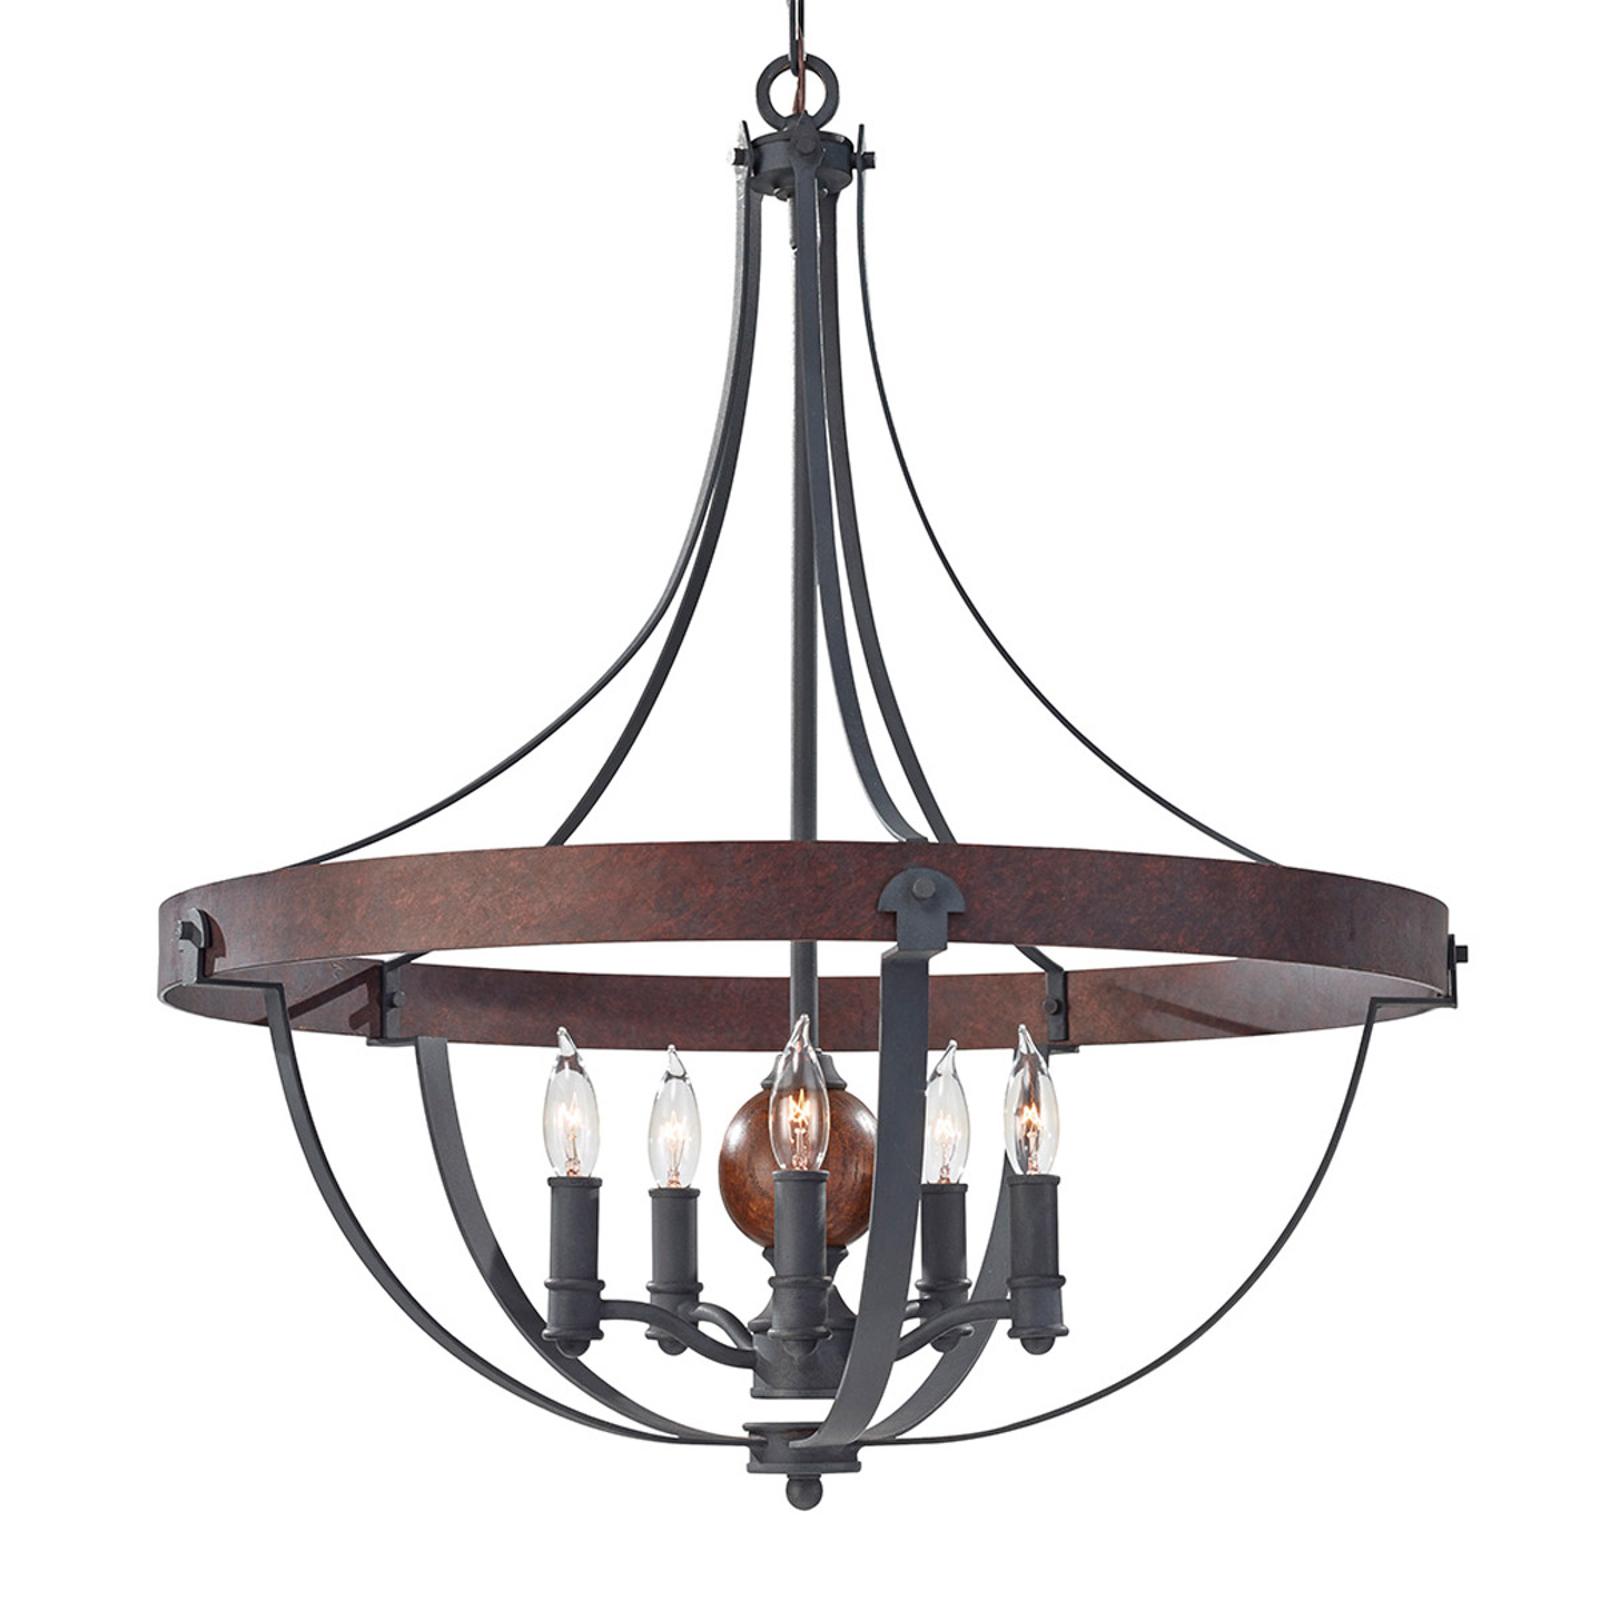 Robusto lampadario Alston